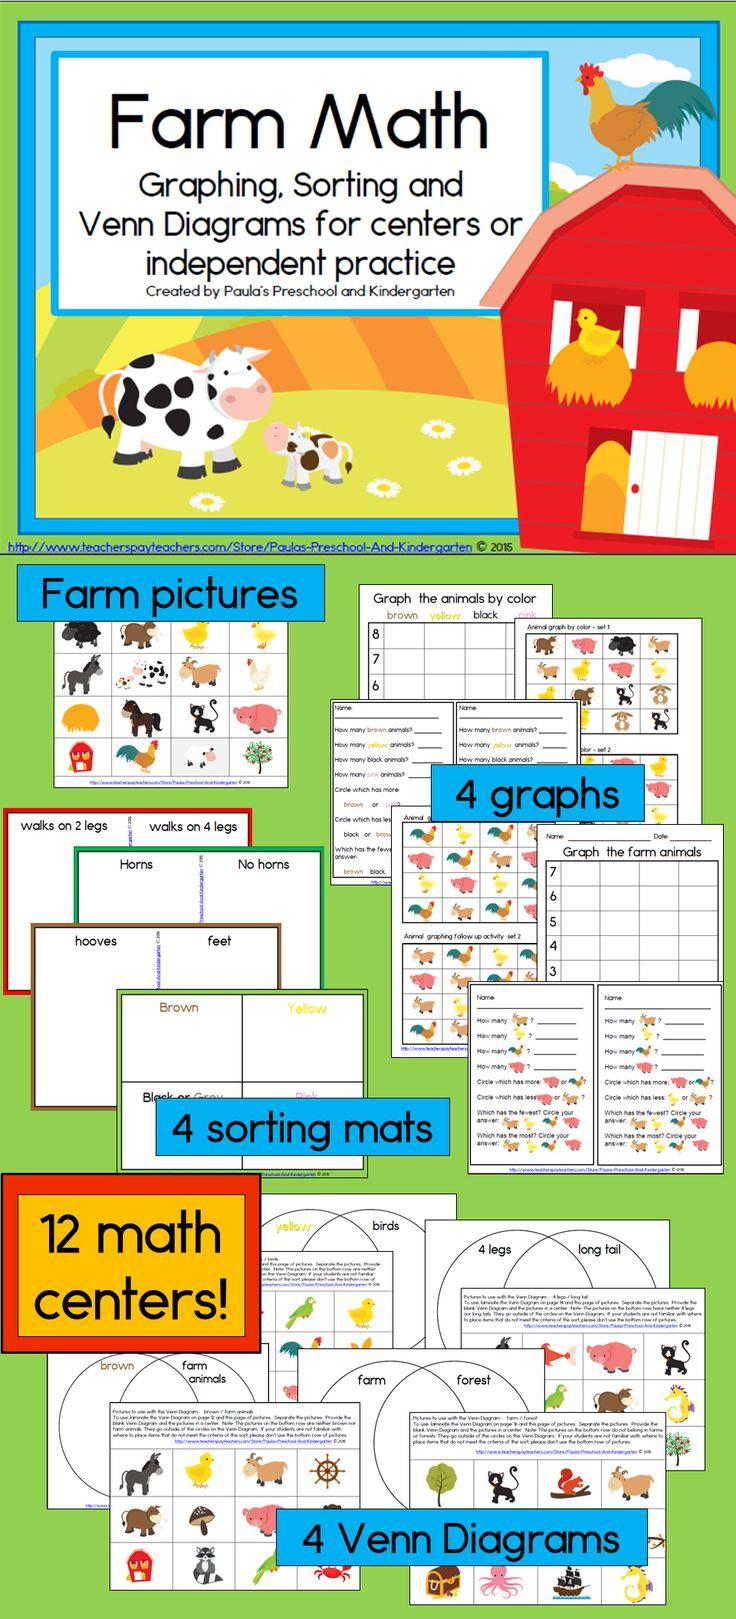 11345 Best Kindergarten Learning Images On Pinterest